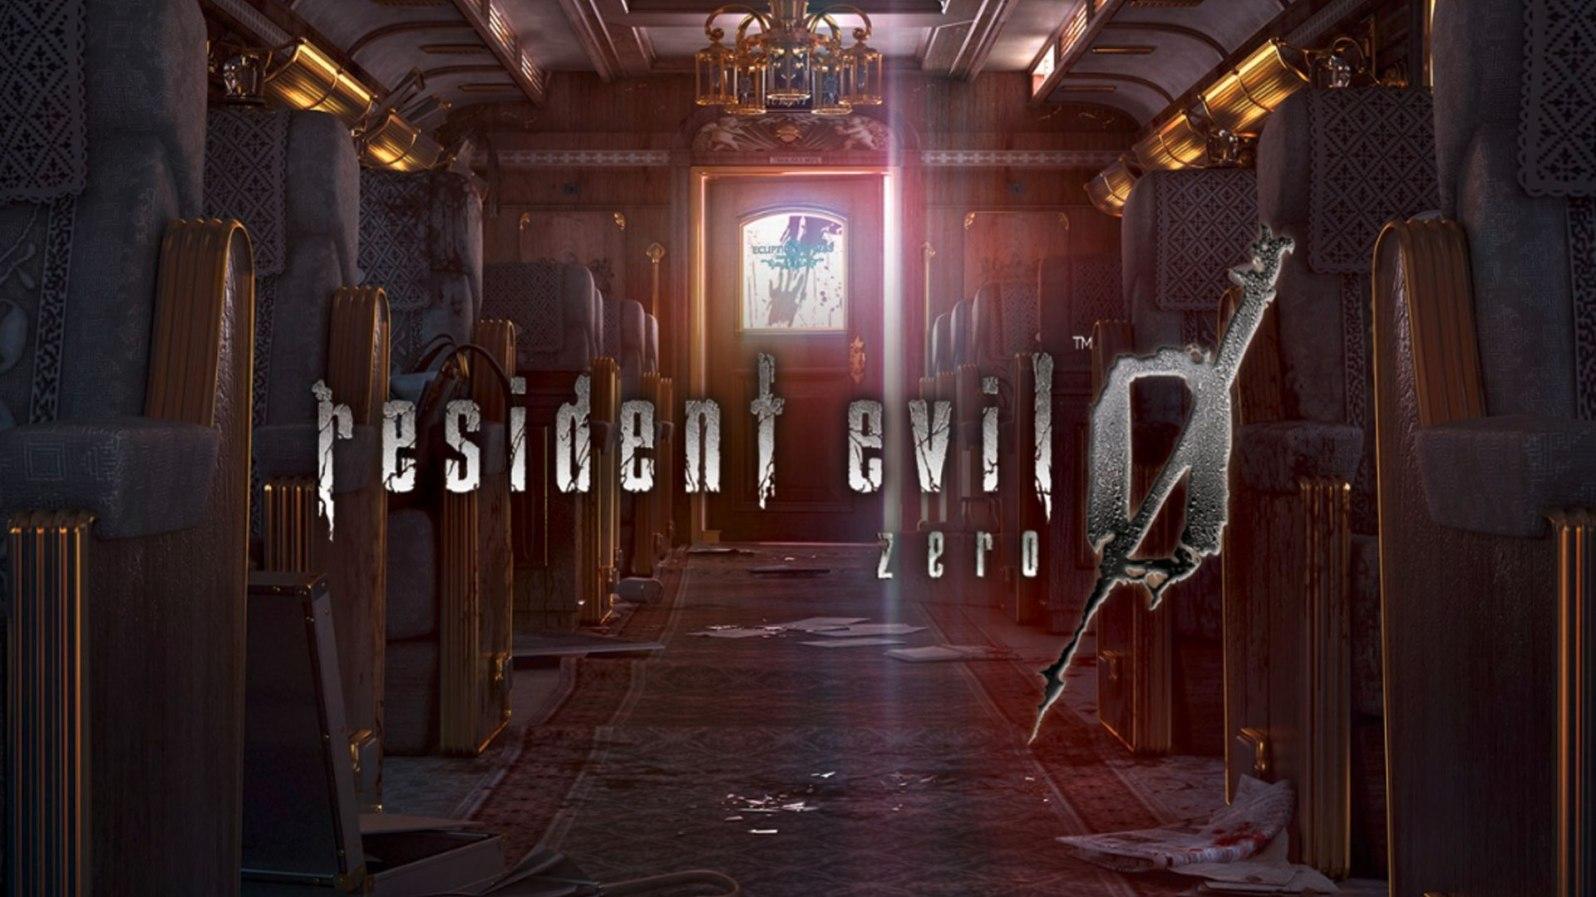 Quelle: Nintendo - Resident Evil Zero